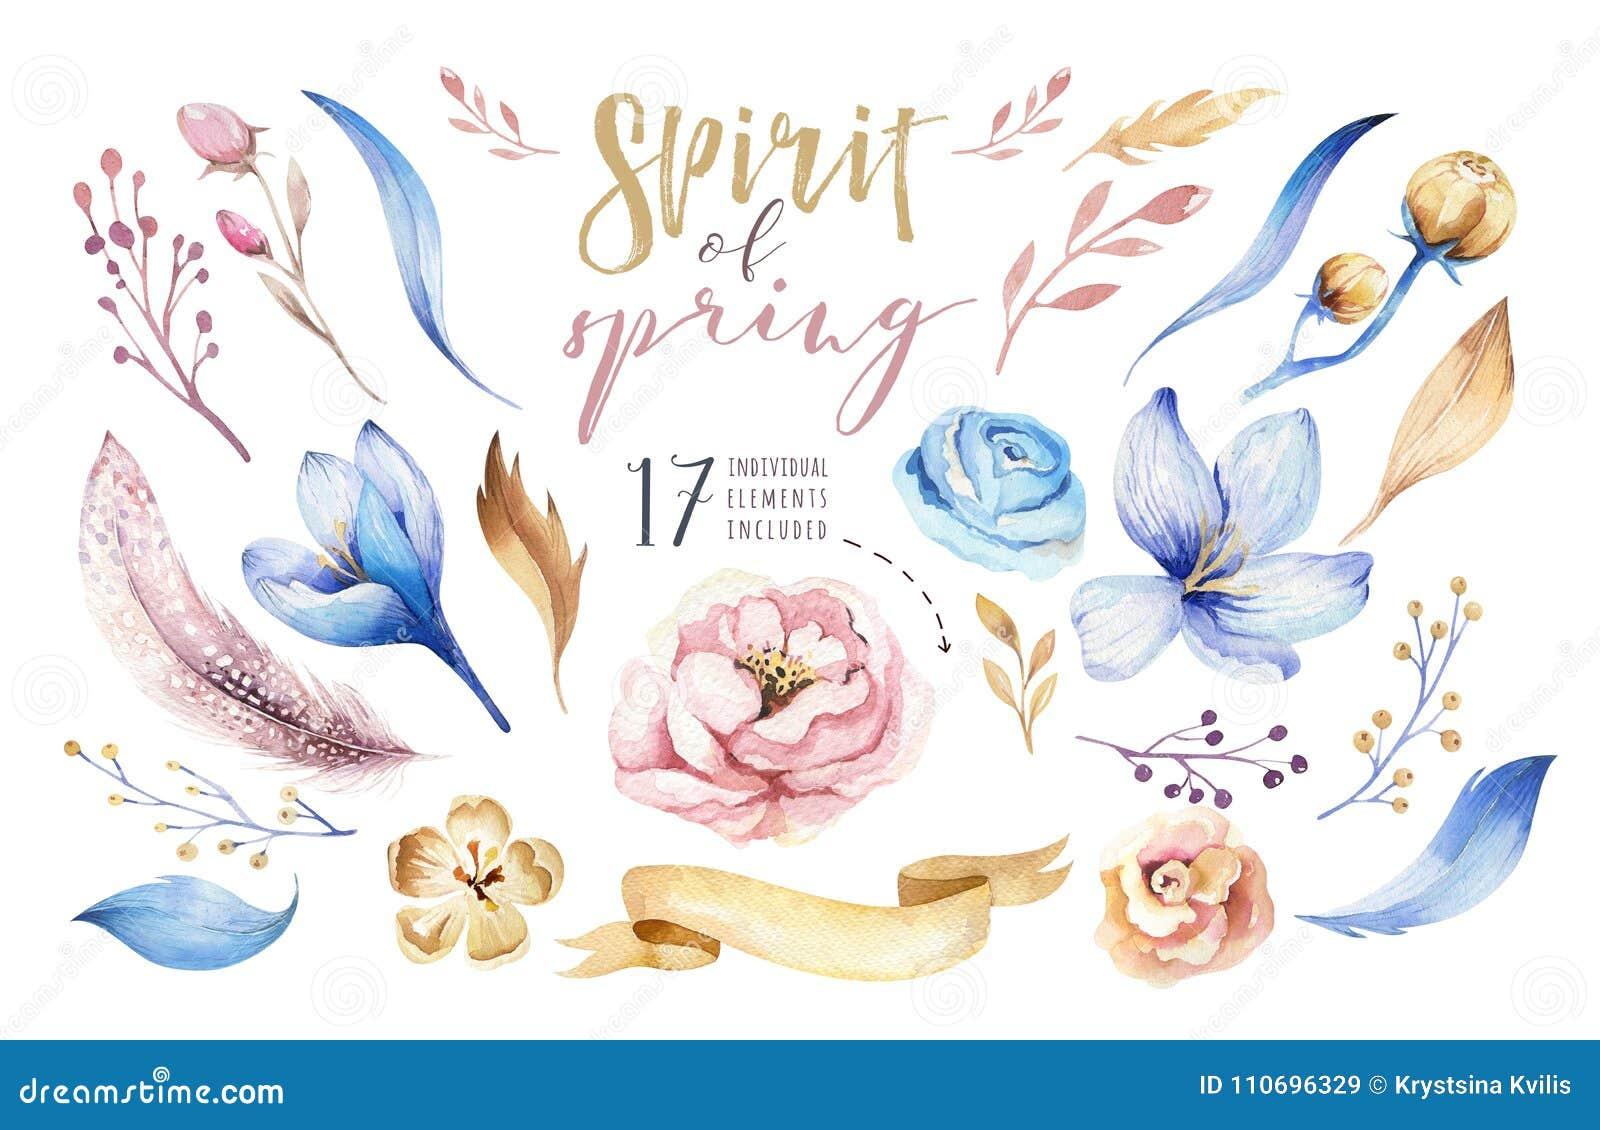 Boho花集合 与叶子和花,画的水彩的五颜六色的花卉收藏 春天或夏天花束设计